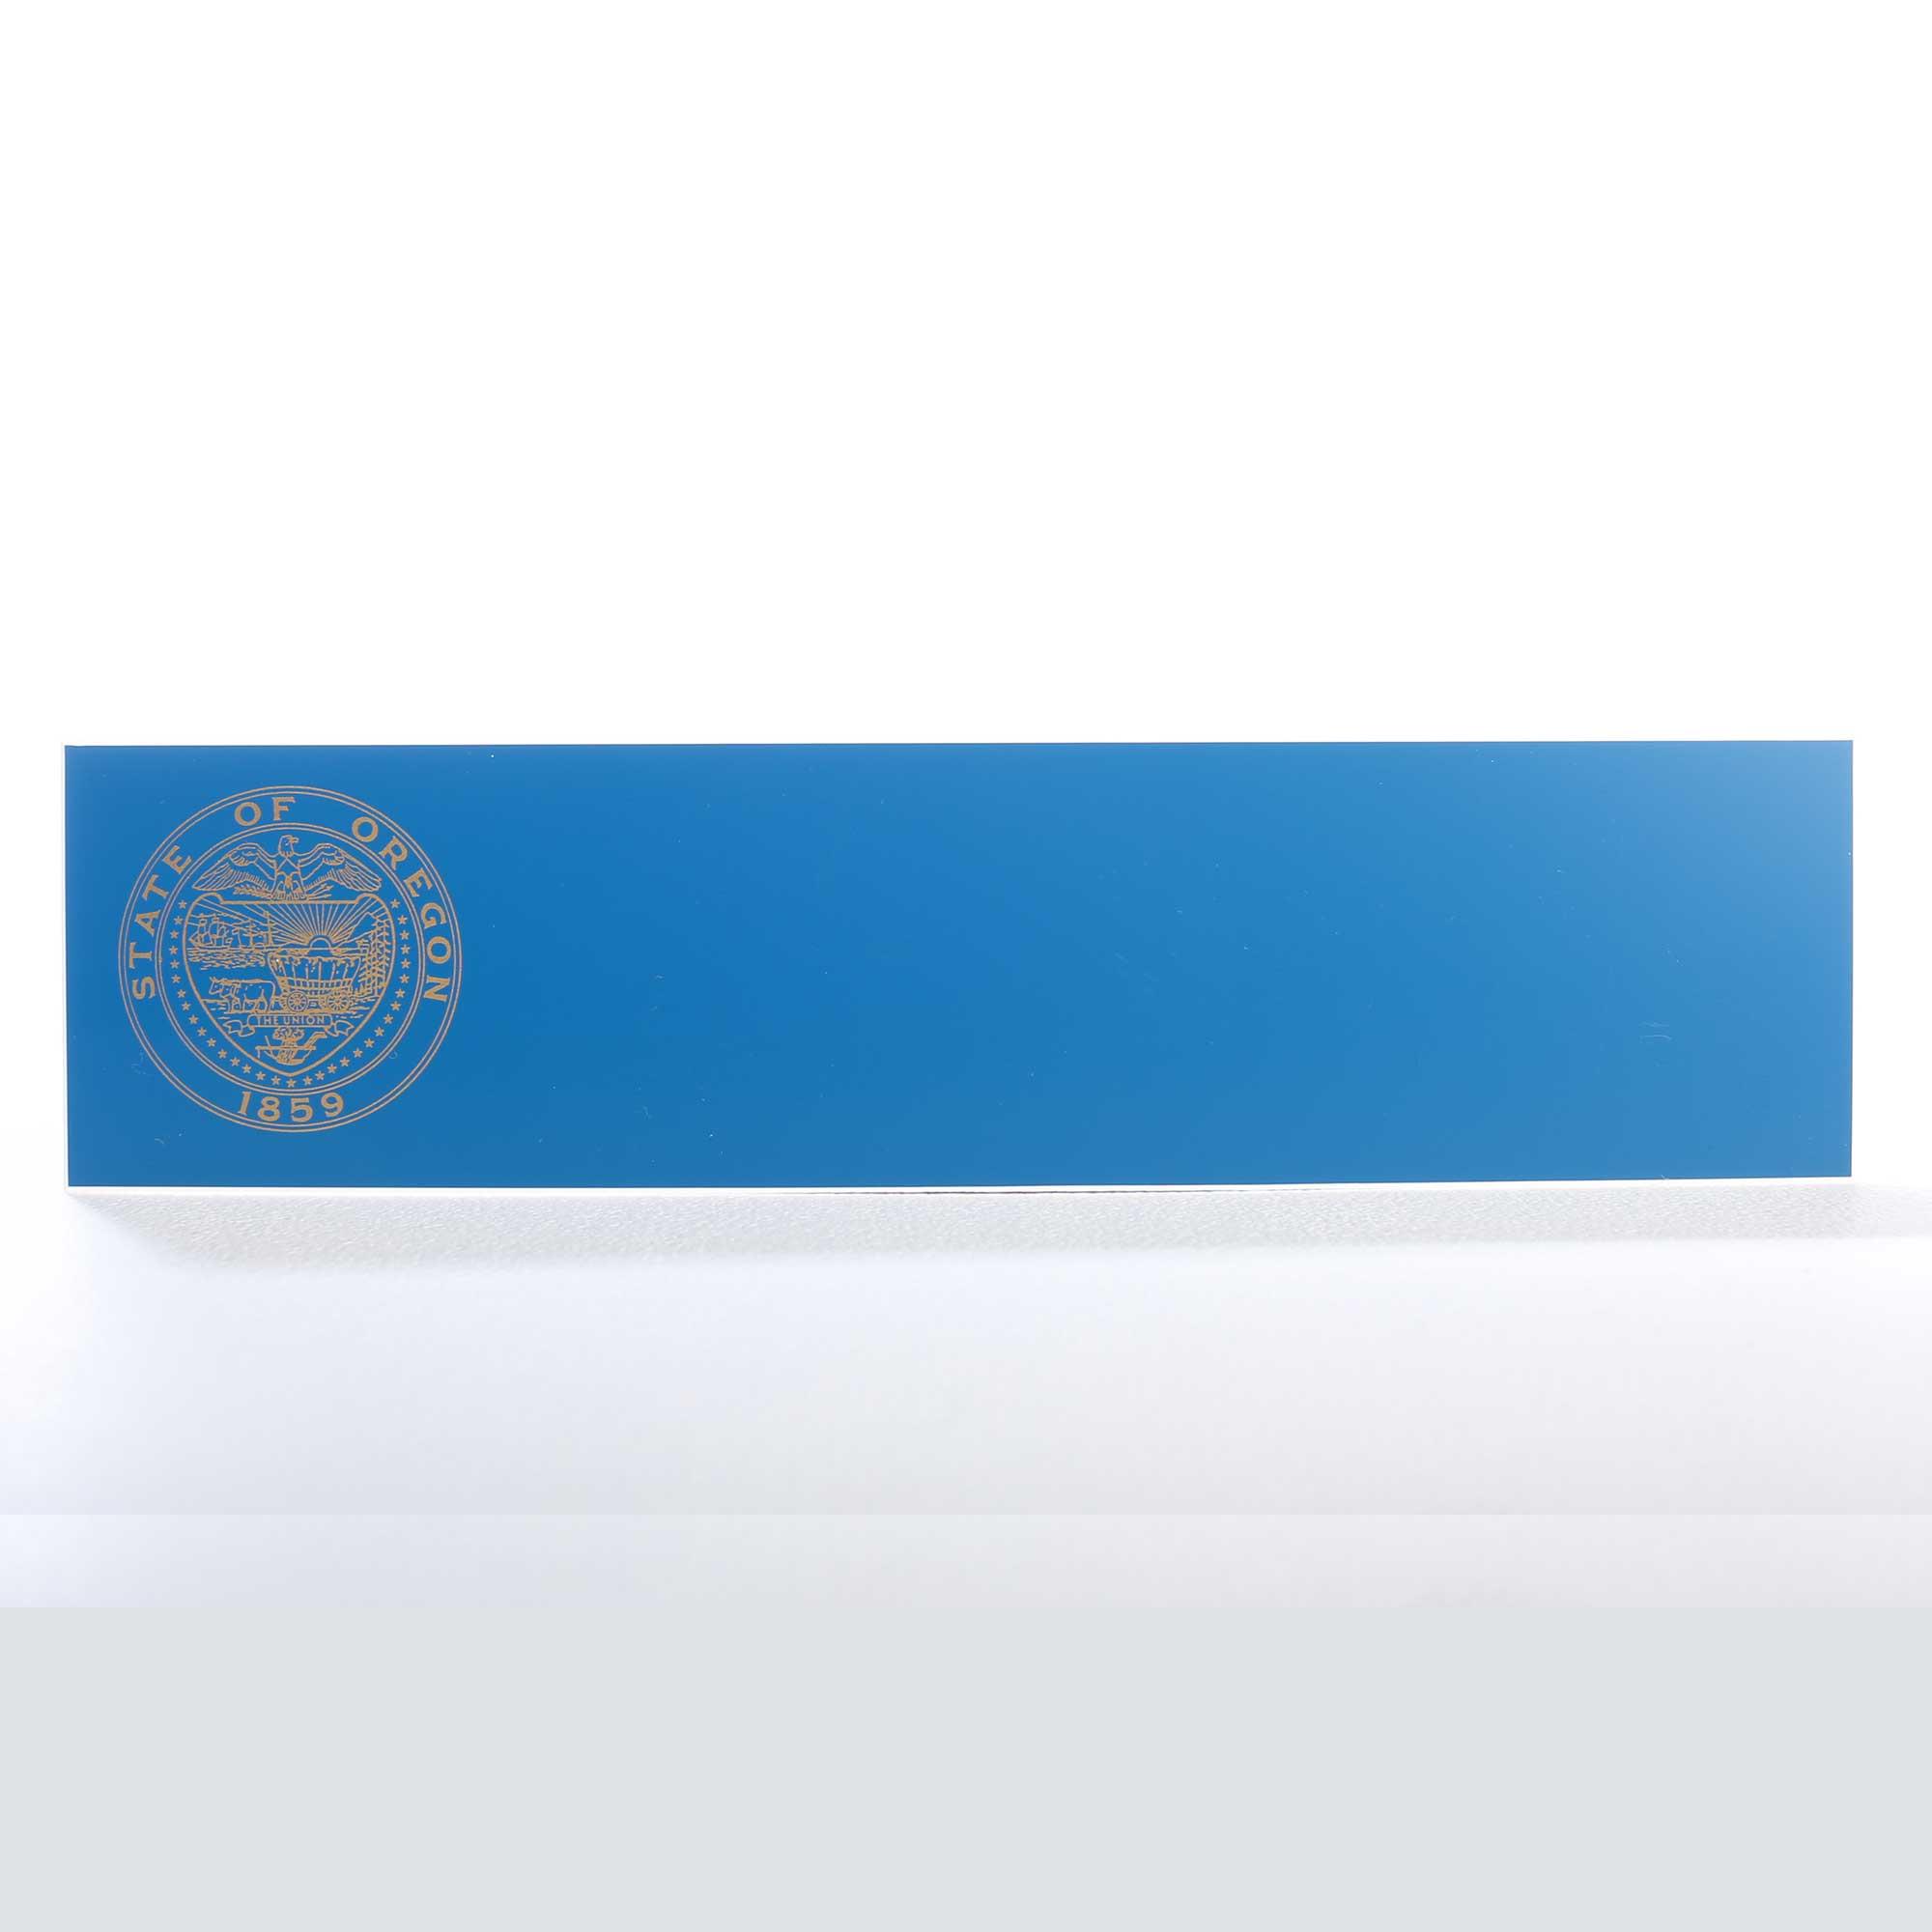 printed state logo name plate